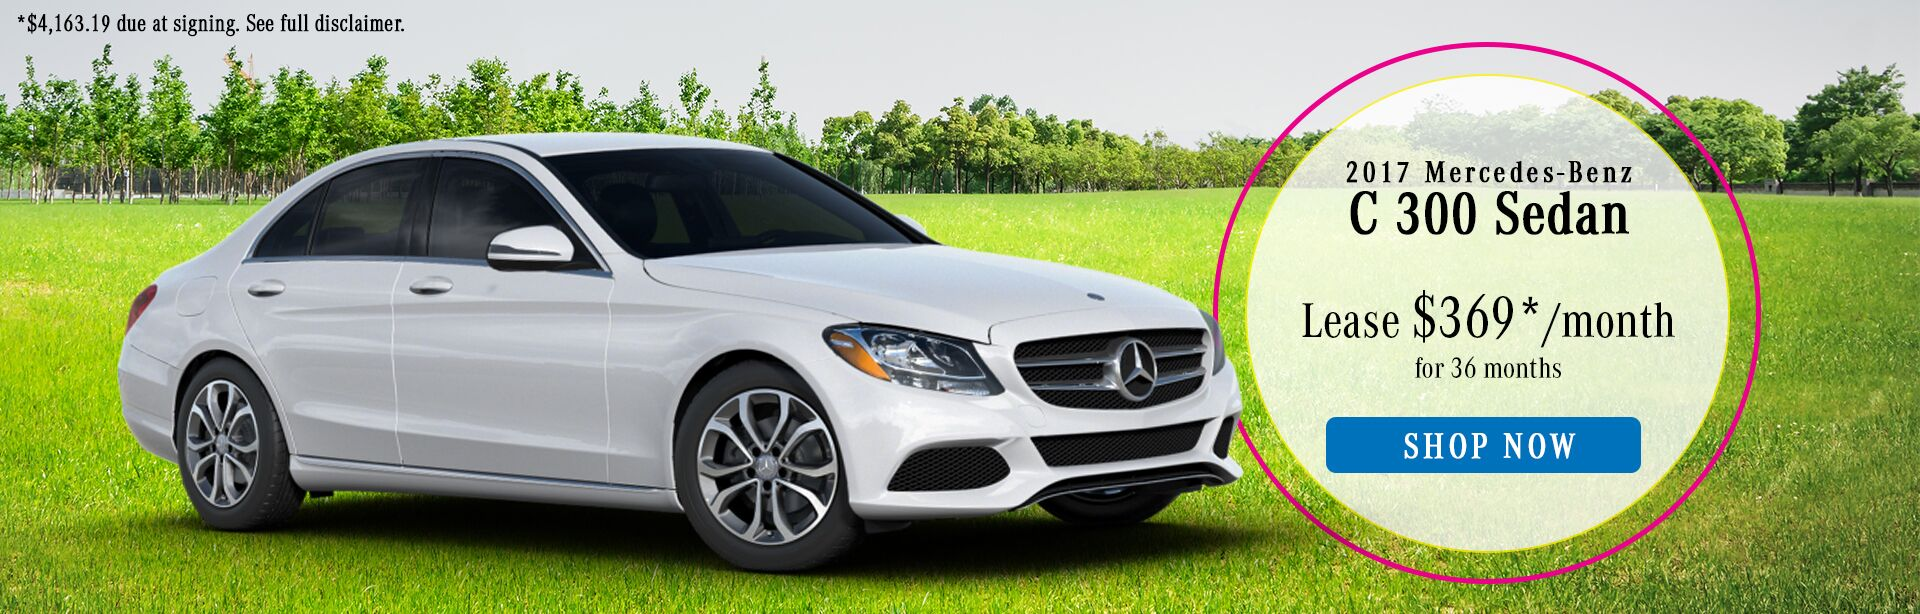 New used car dealership in el paso tx mercedes benz for Mercedes benz el paso texas